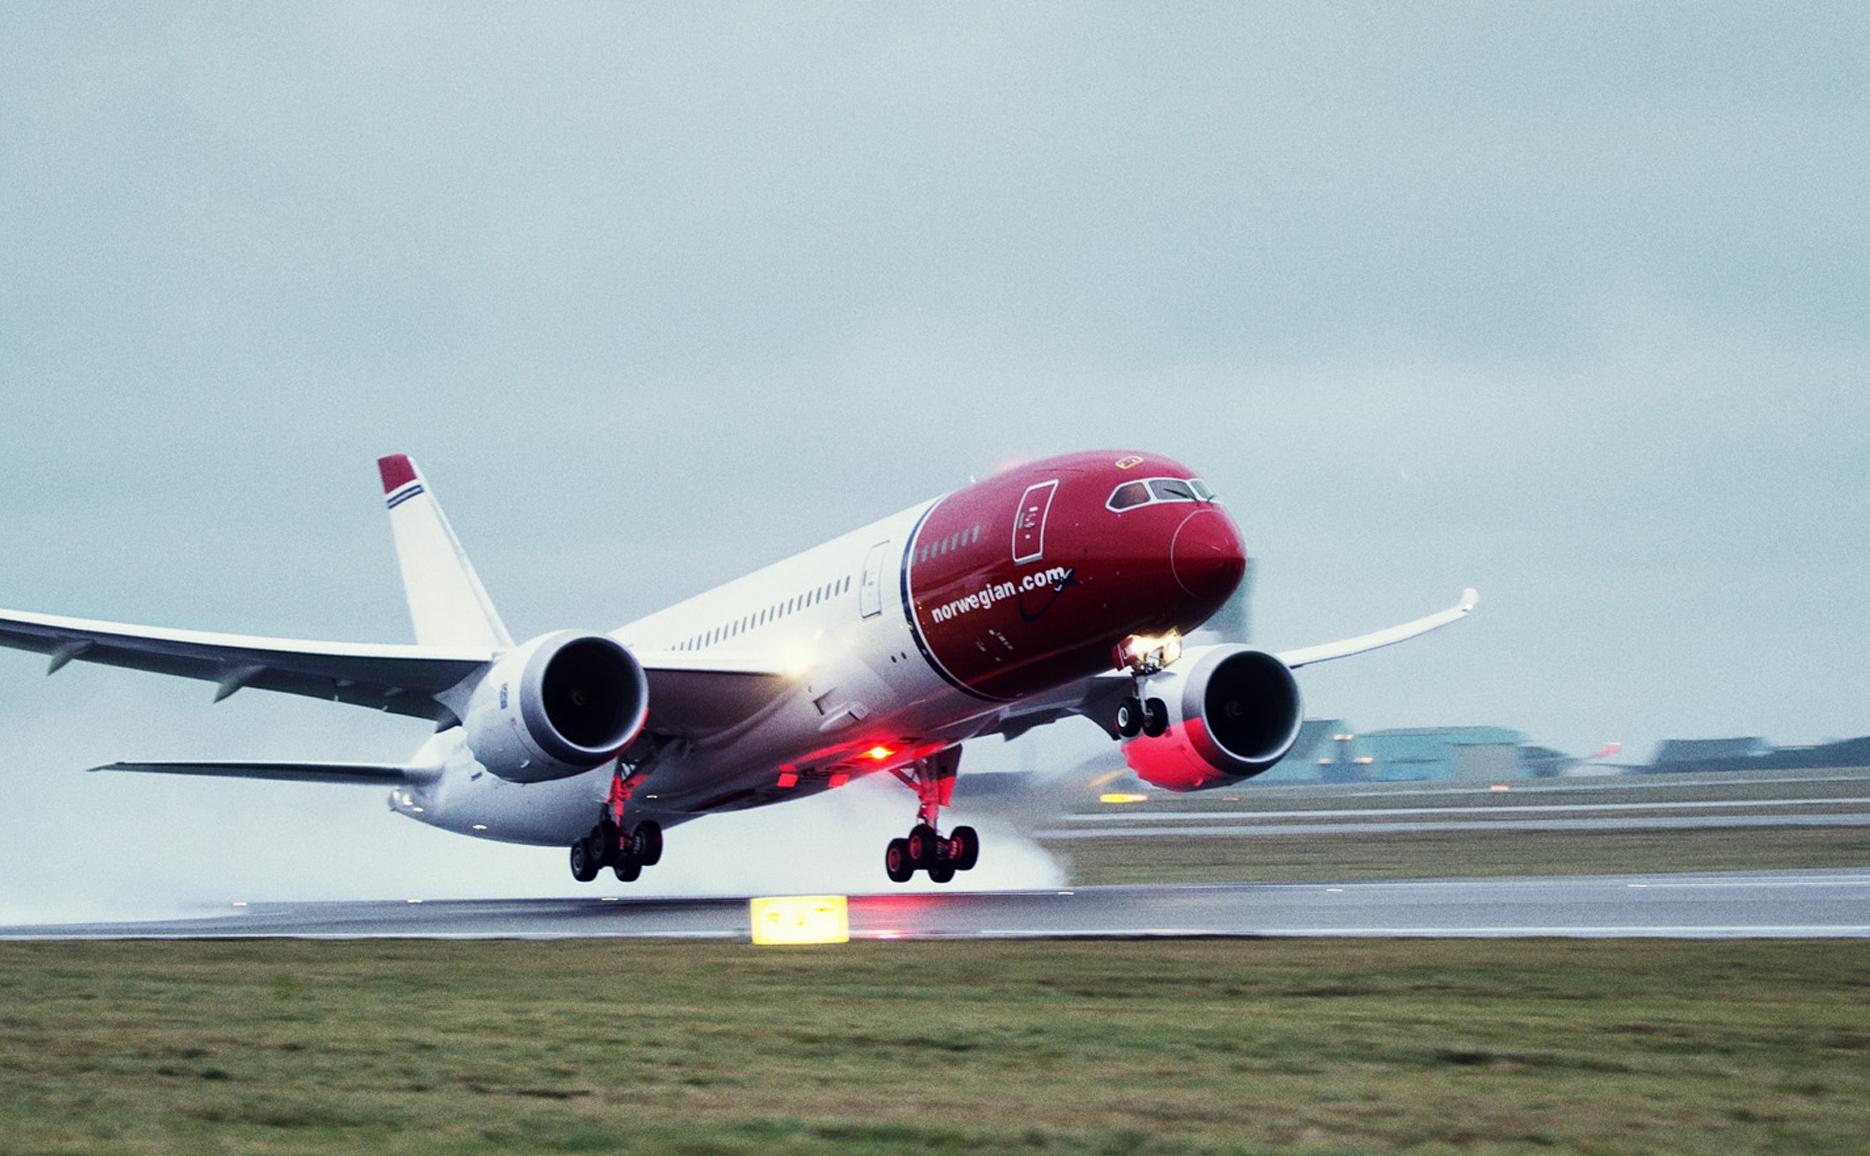 En Norwegian Boeing B787 Dreamliner letter fra Københavns Lufthavn. Pressefoto.